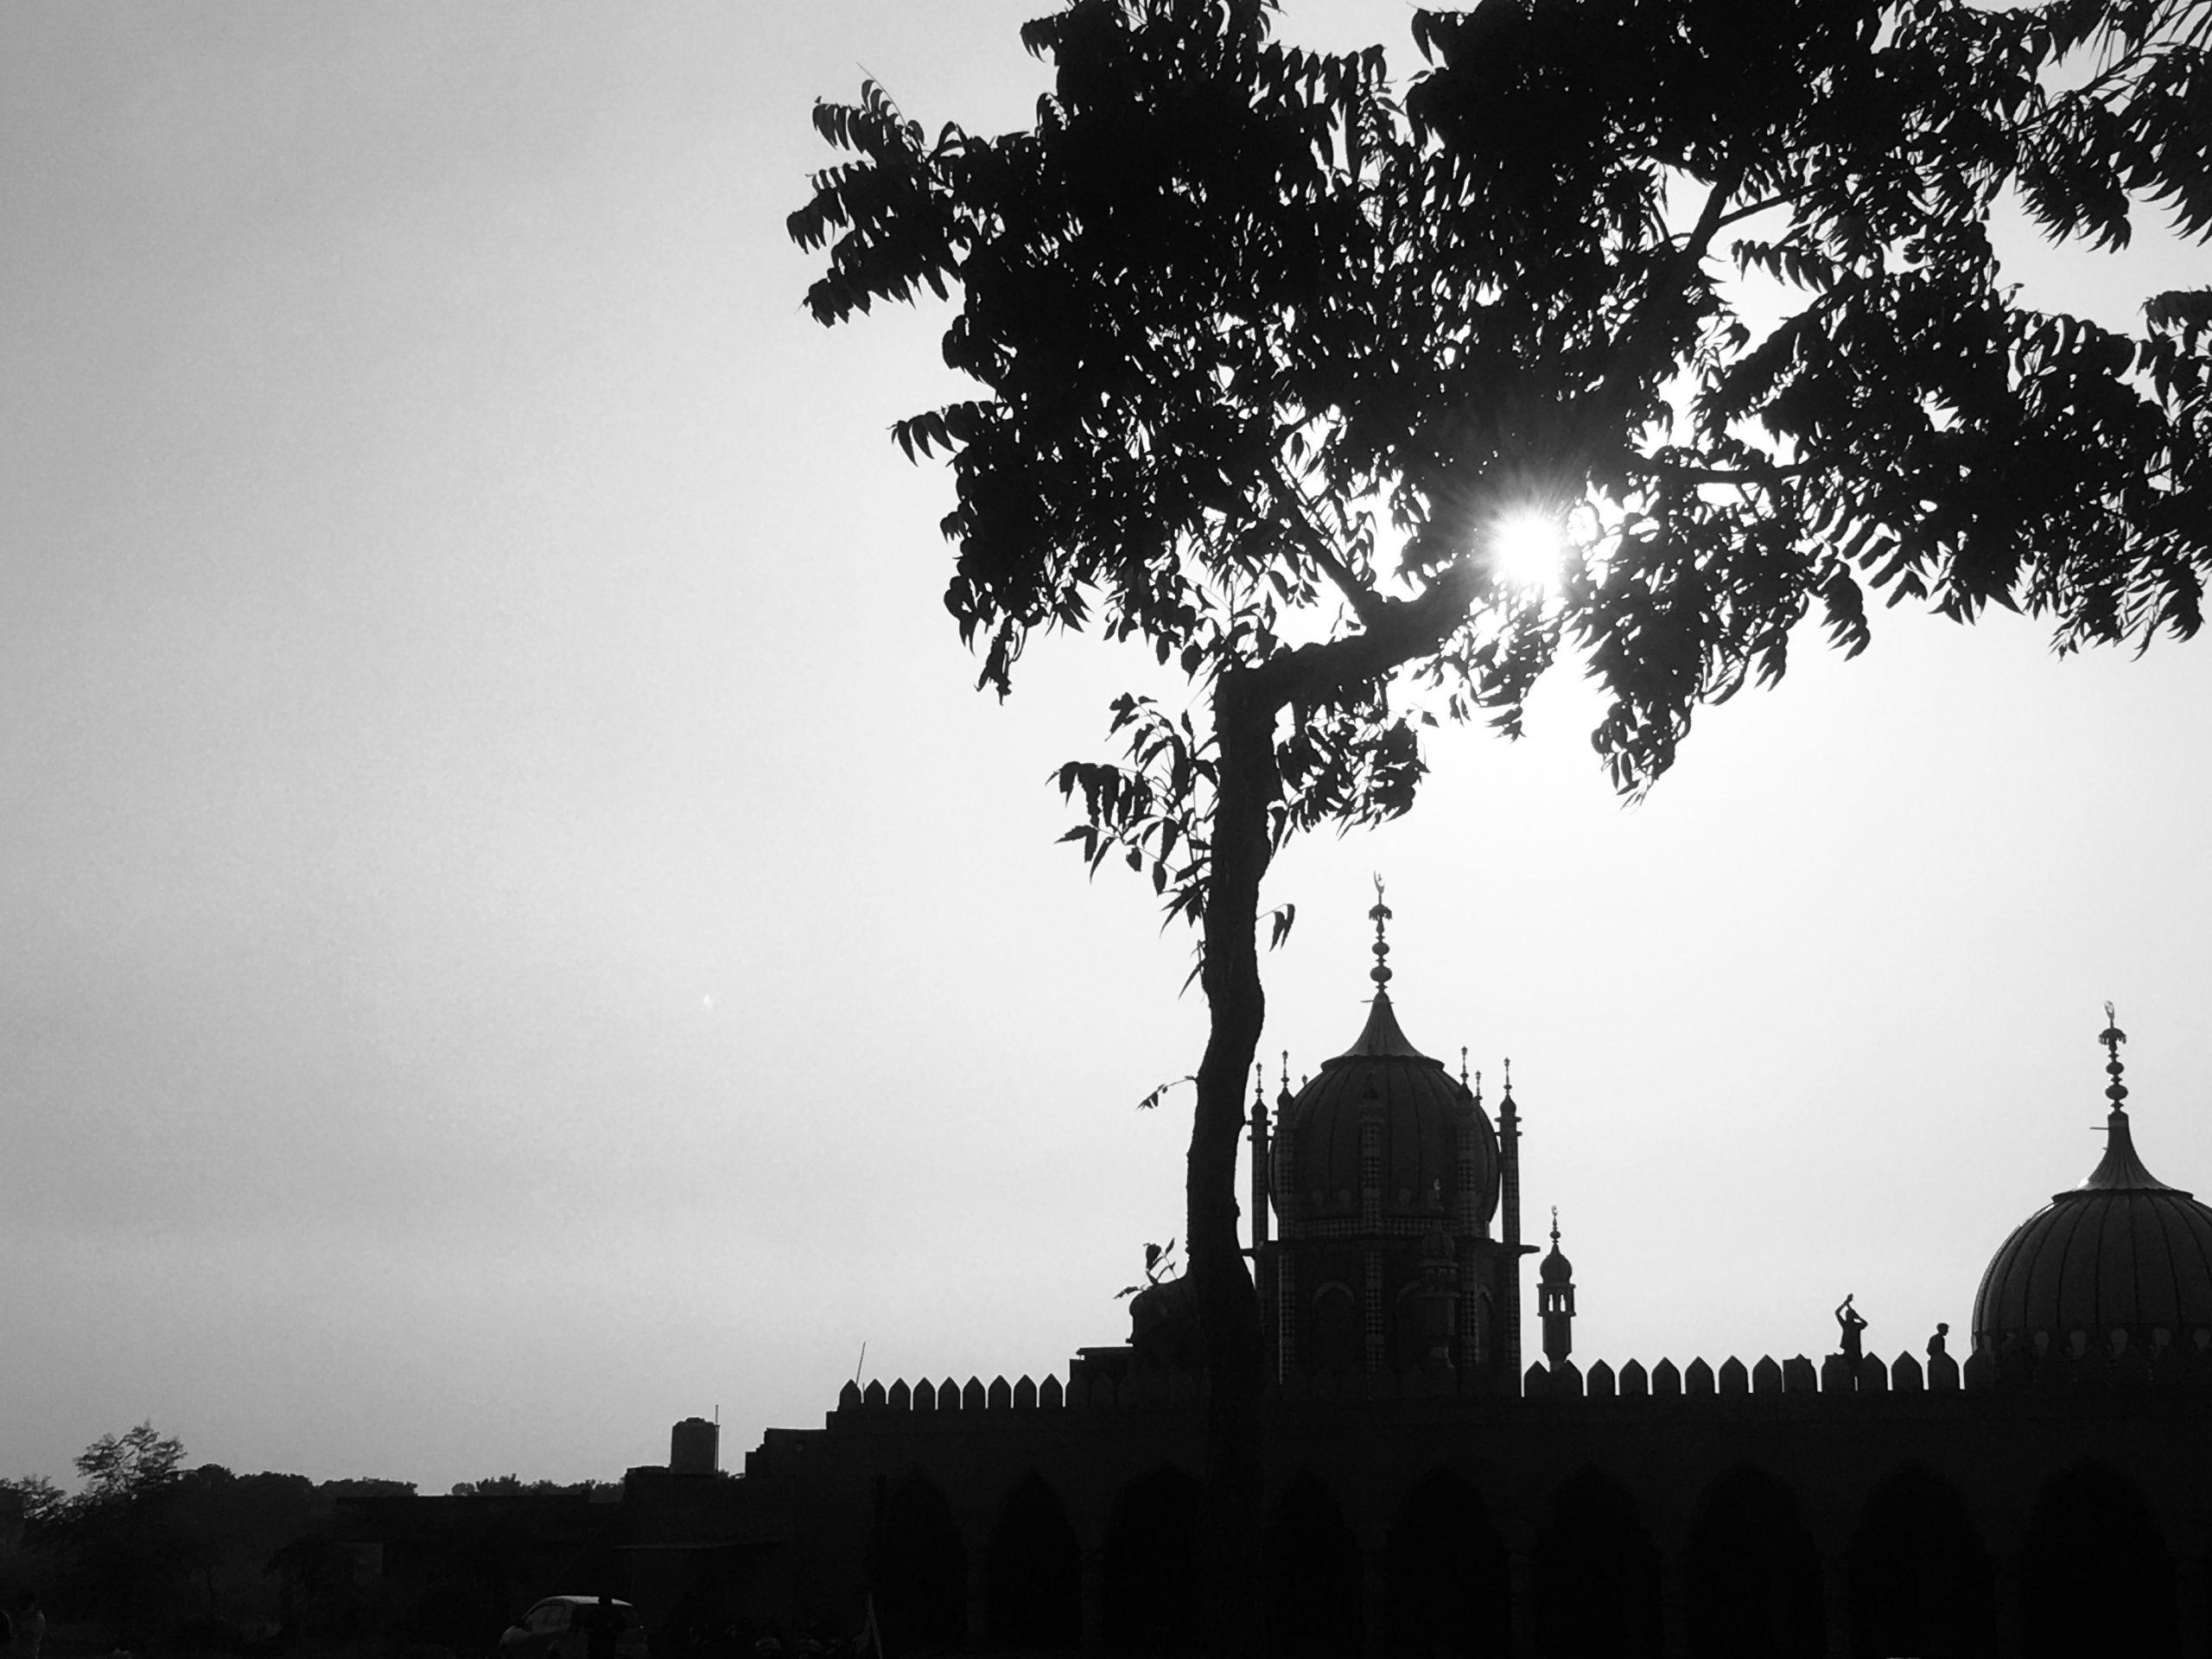 Sunset over a Gurudwara